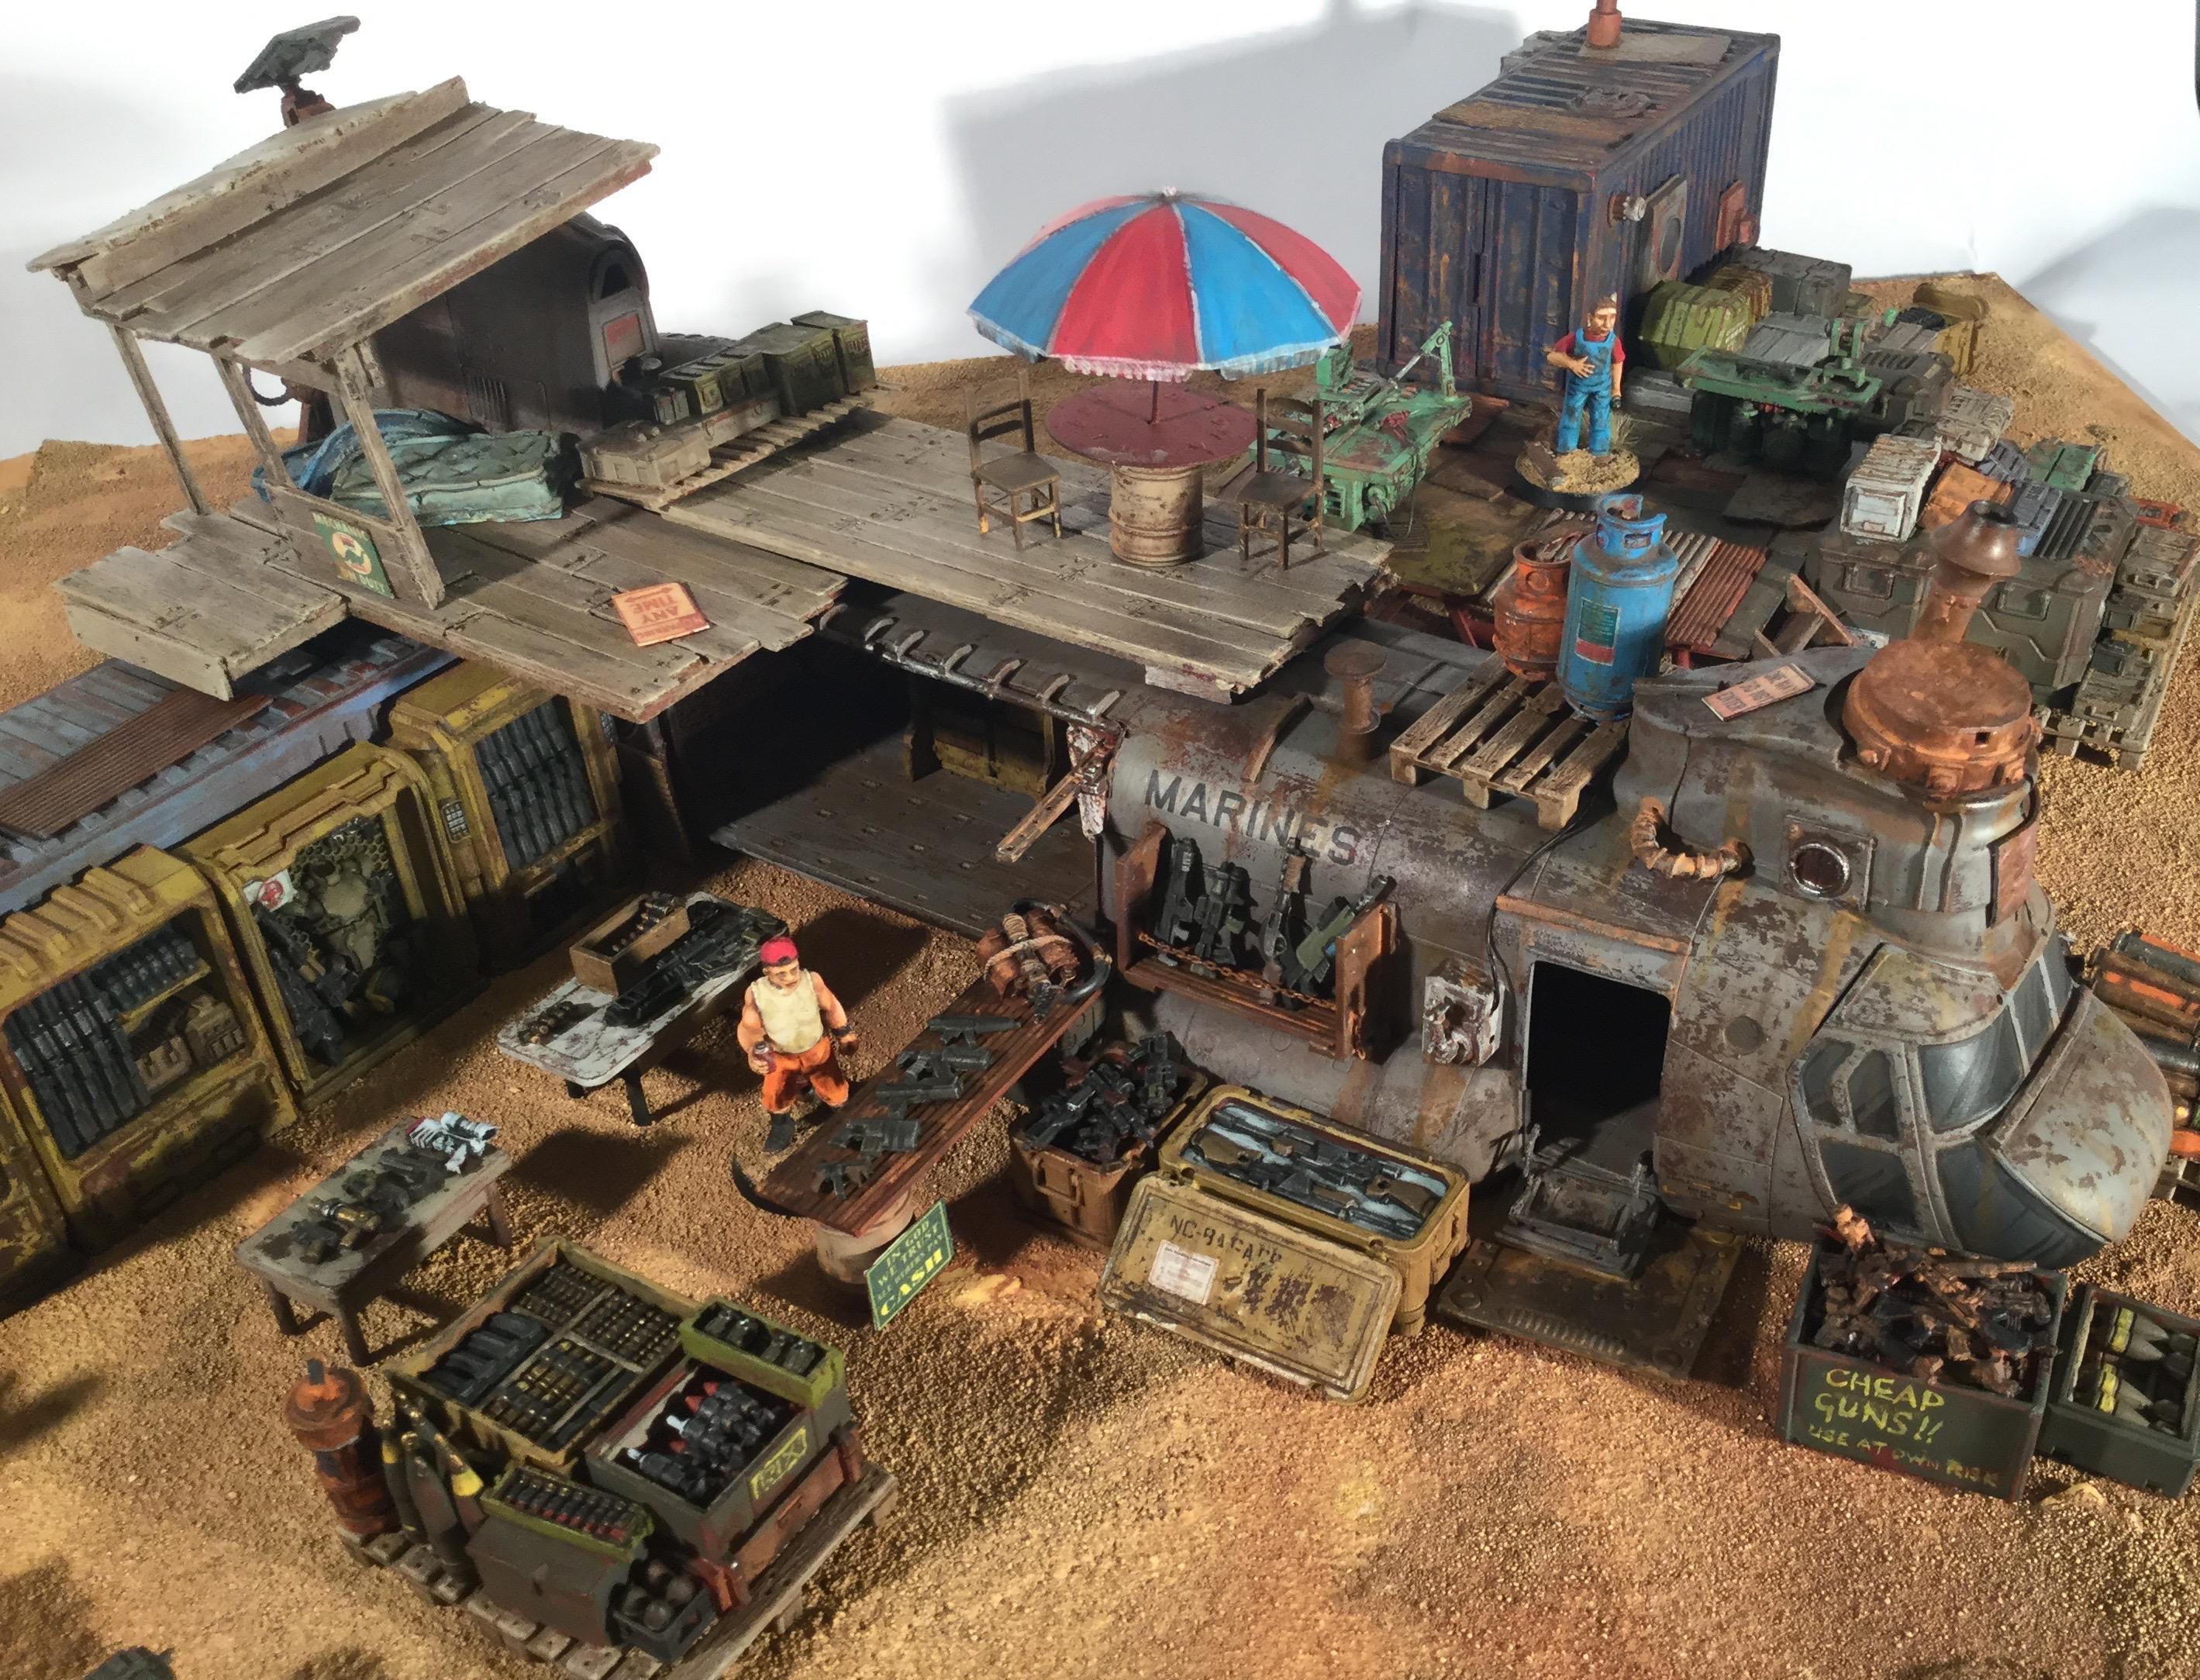 Fallout, Future Wars, Post Apocalypse, Rust, Terrain